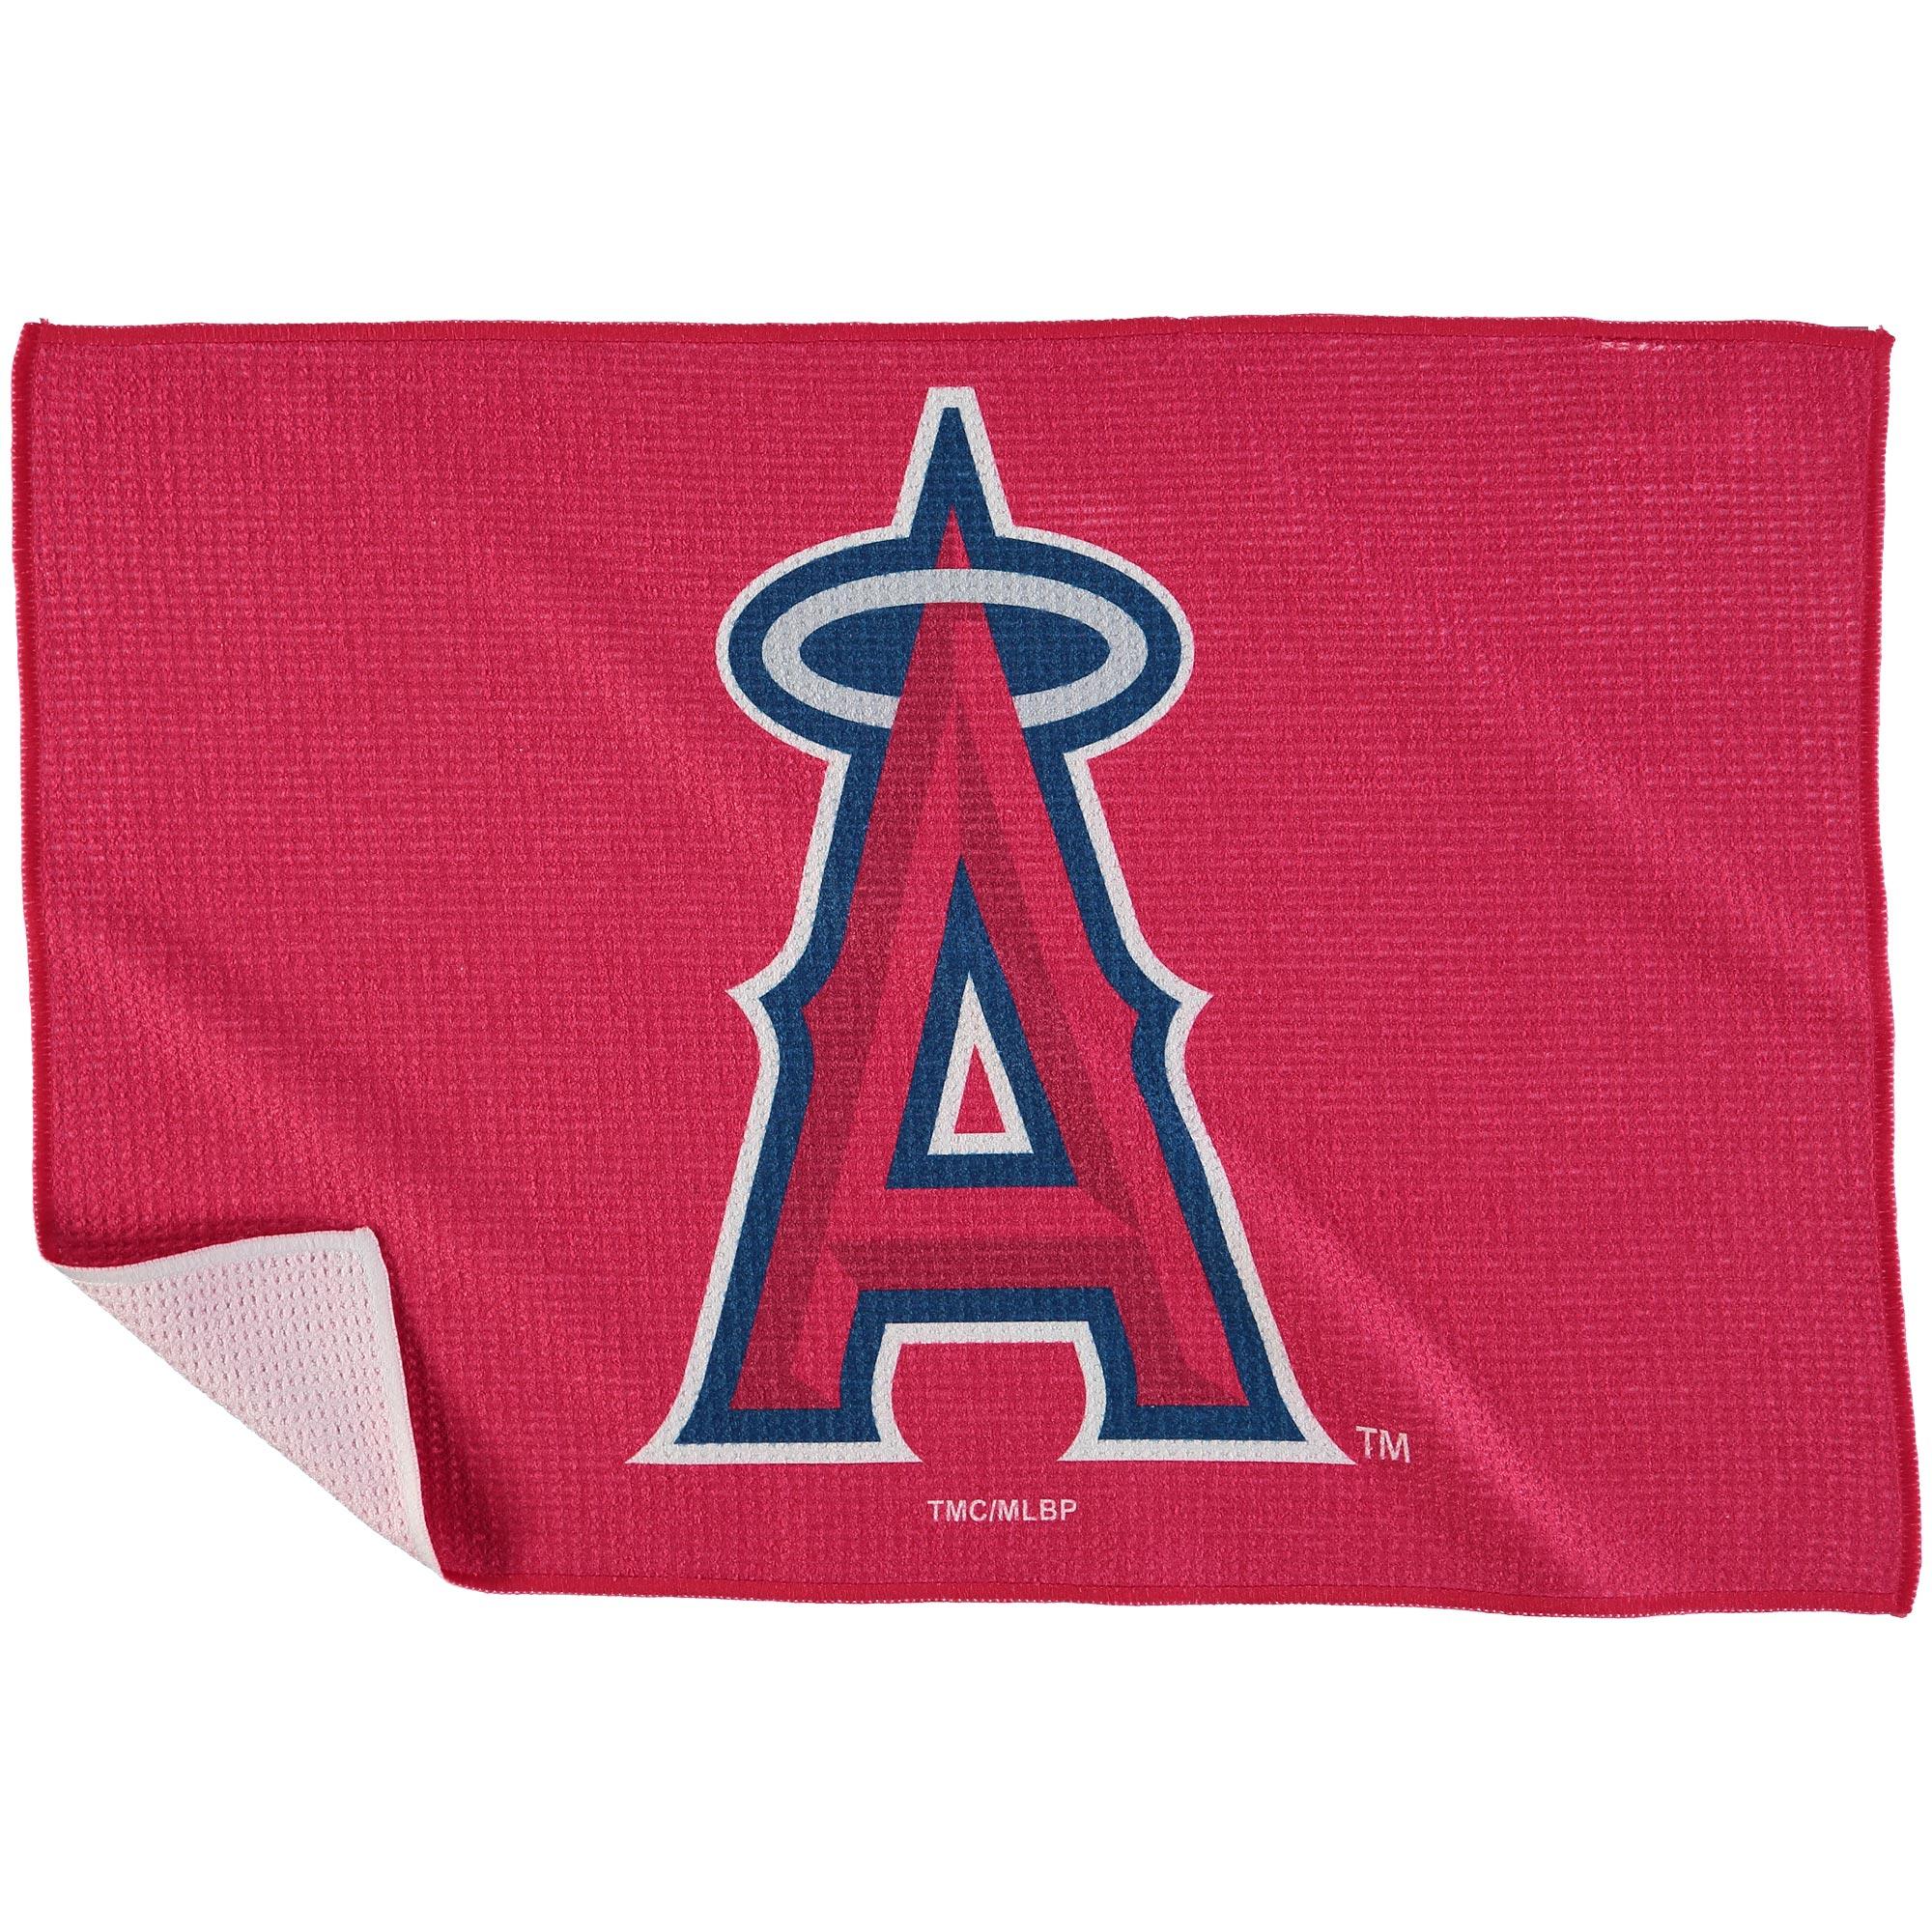 "Los Angeles Angels 16"" x 24"" Microfiber Towel - No Size"